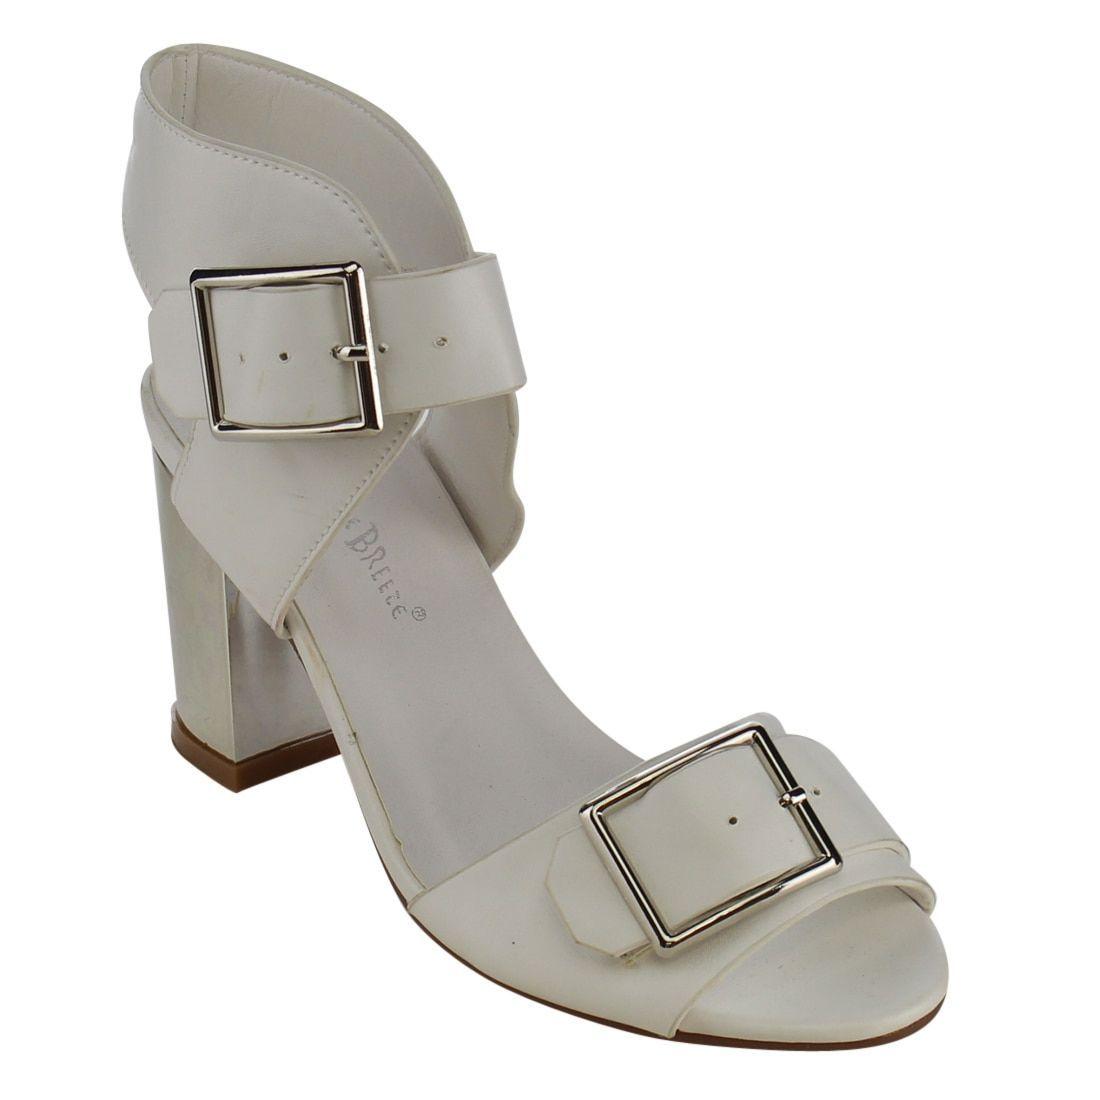 Nature Breeze Women's FG76 Buckled Strap Chunky Block Heel Sandals